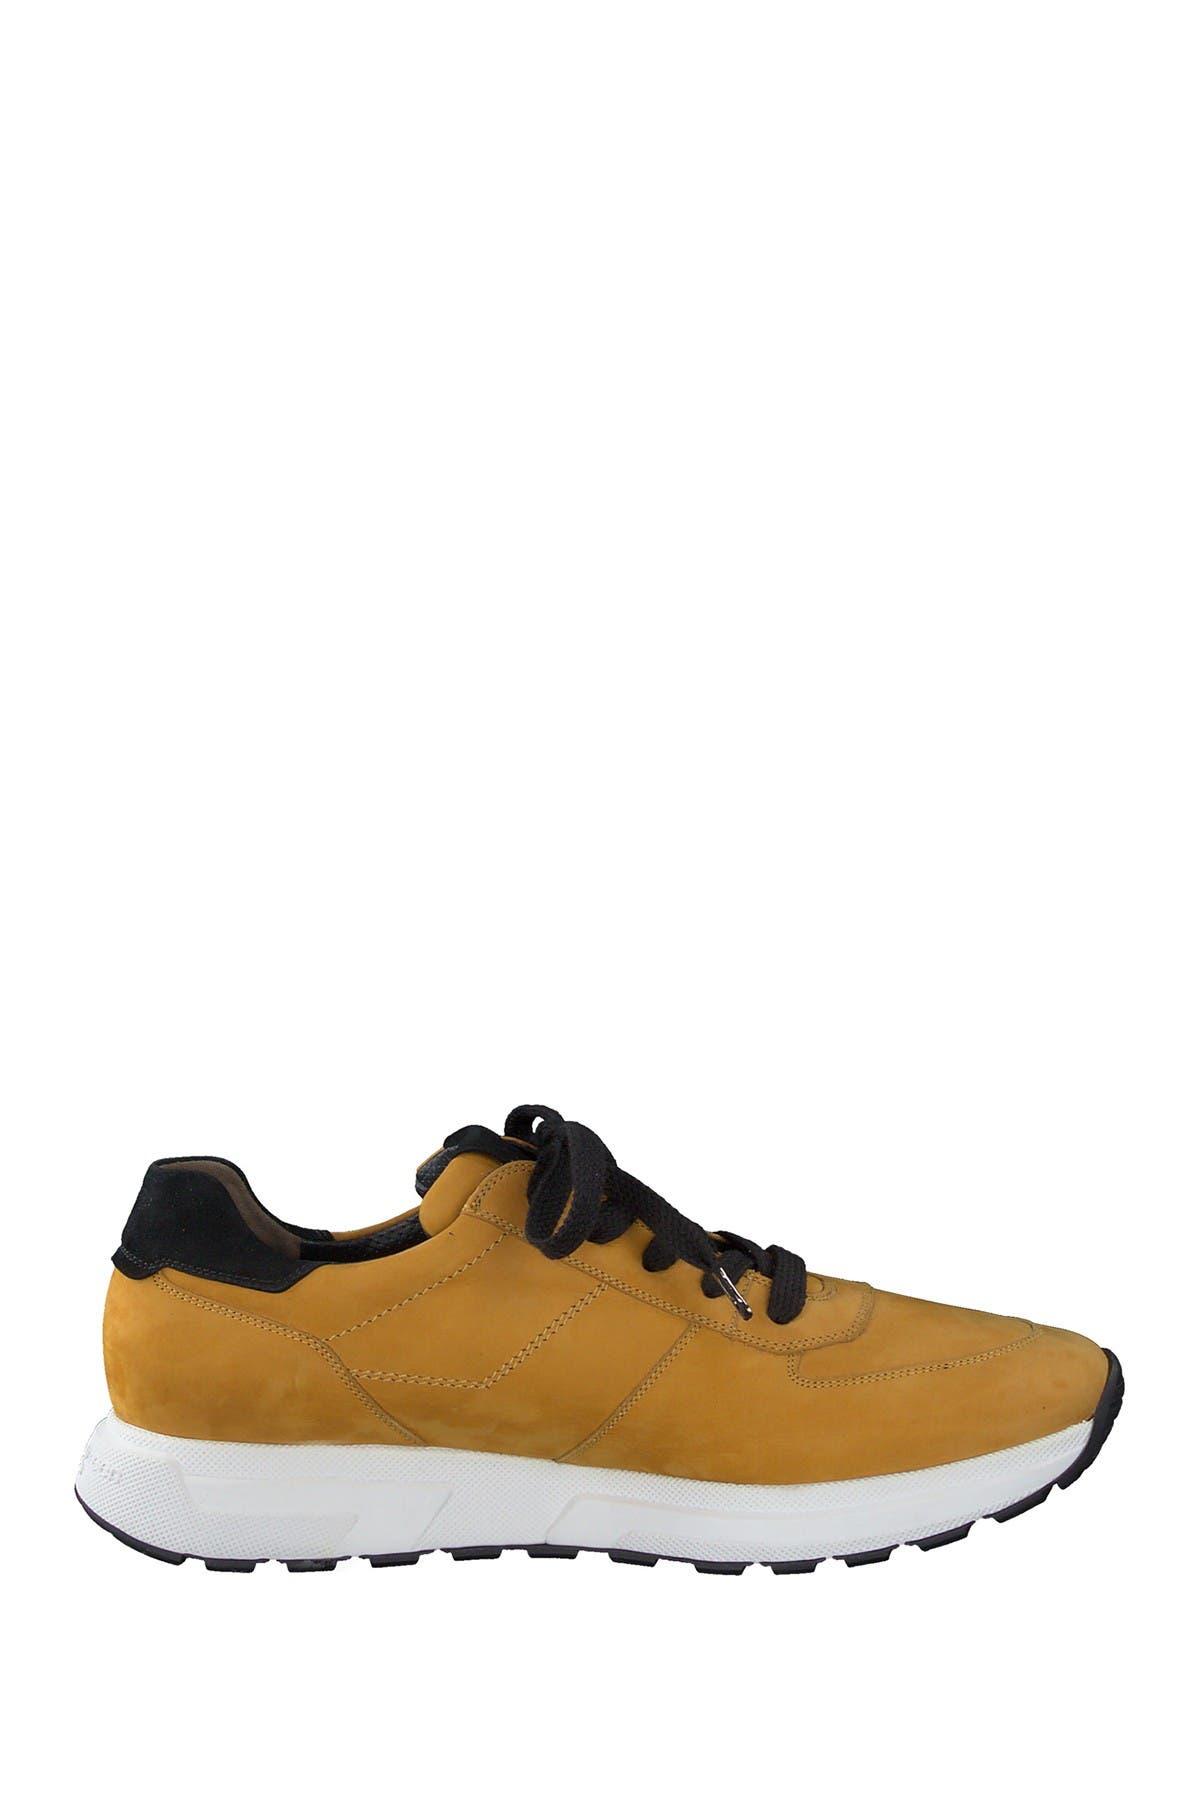 Image of Paul Green Suede Sport Sneaker